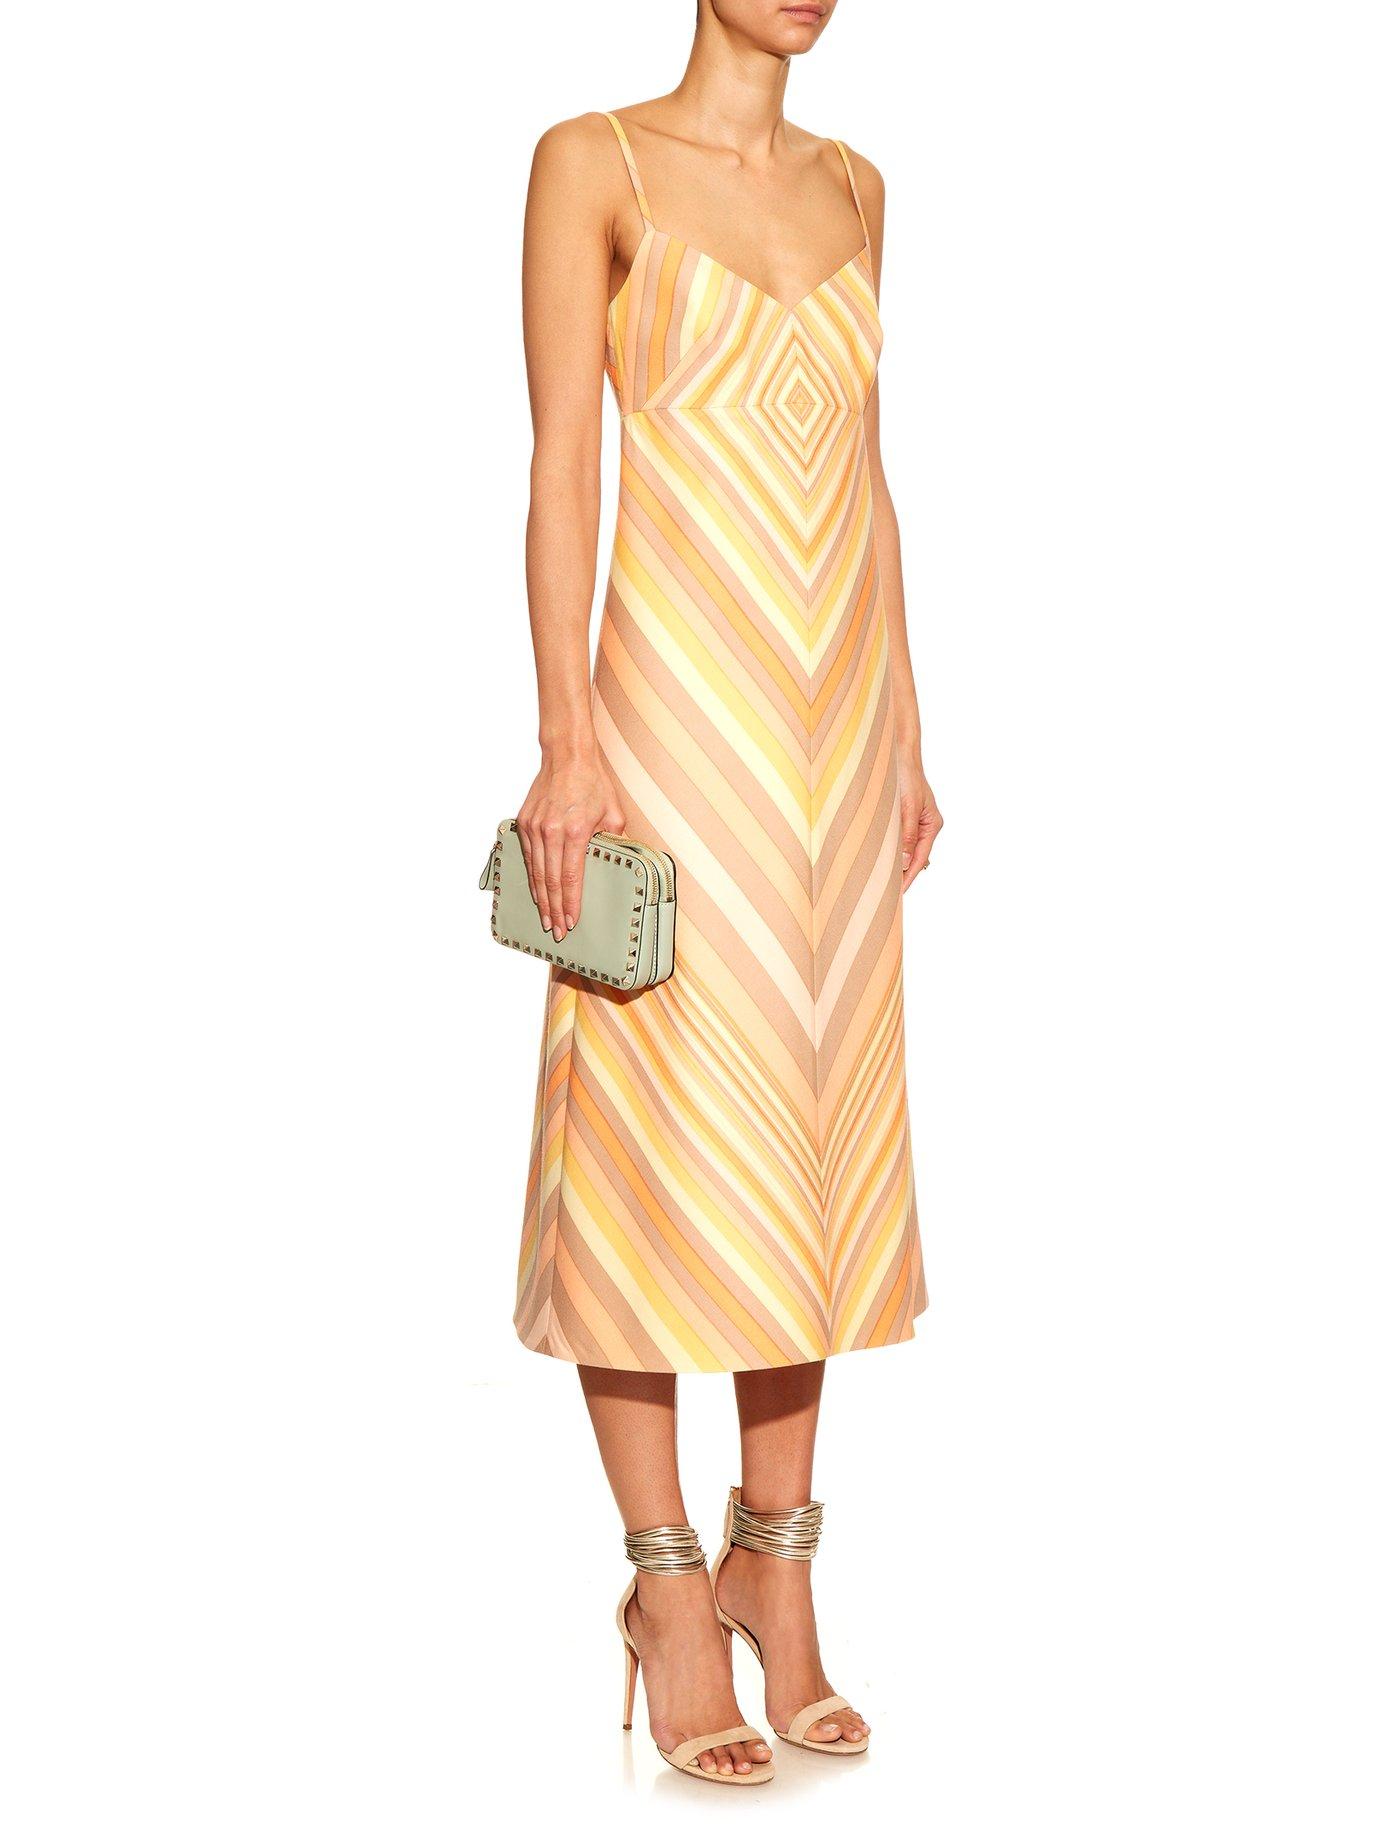 Native Couture 1975-print midi dress by Valentino